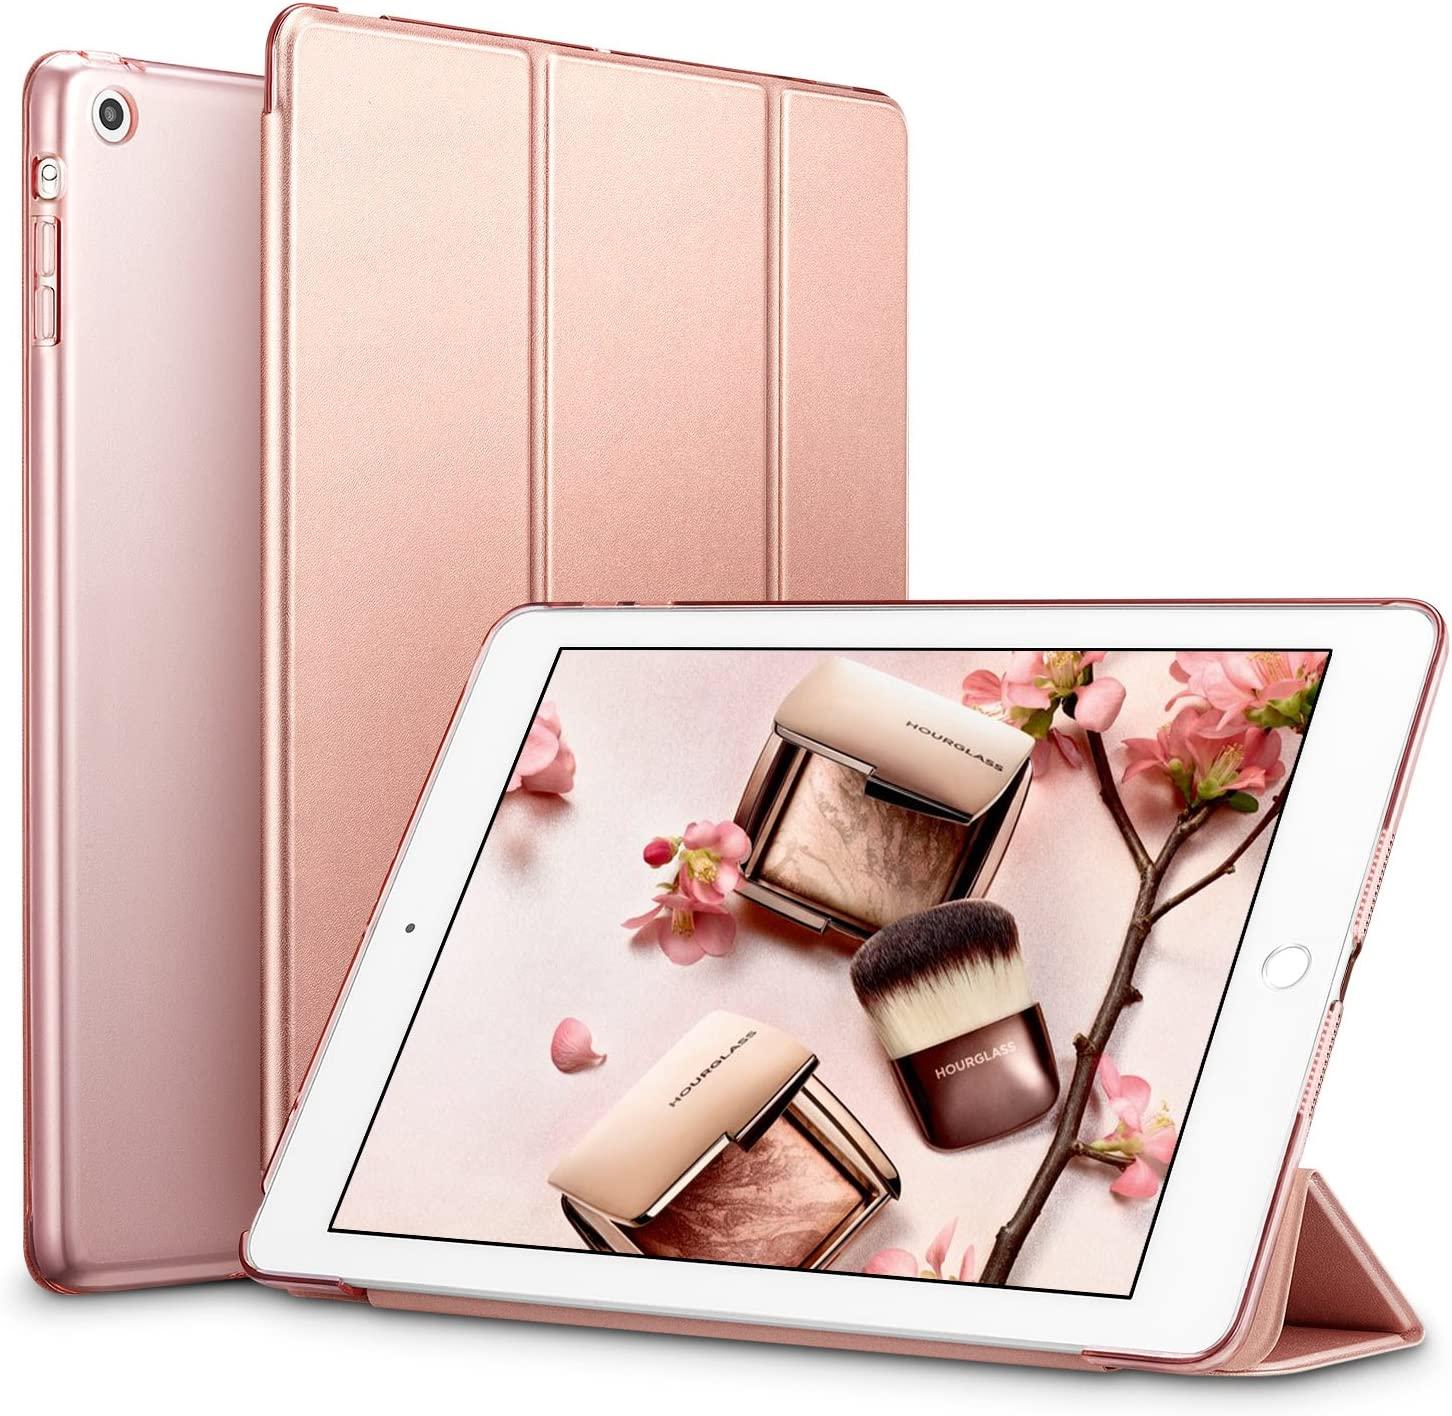 ESR Yippee Trifold Smart Case for iPad Mini 1/2/3, Lightweight Trifold Stand Case with Auto Sleep/Wake, Microfiber Lining, Hard Back Cover for iPad Mini 1/Mini 2/Mini 3, Rose